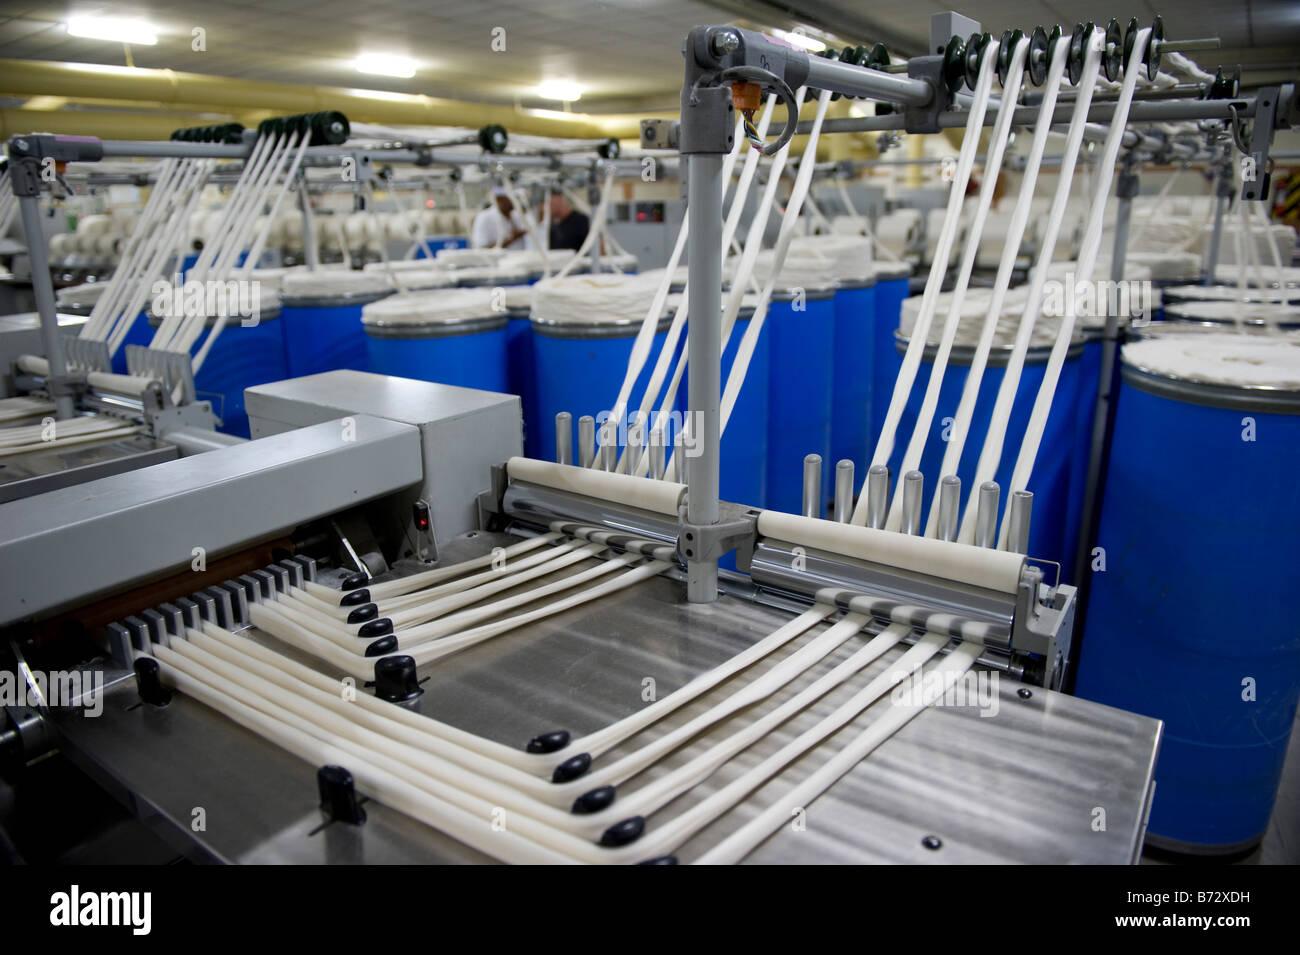 Shandong Sishui P & W Economic Trading Co., Ltd.